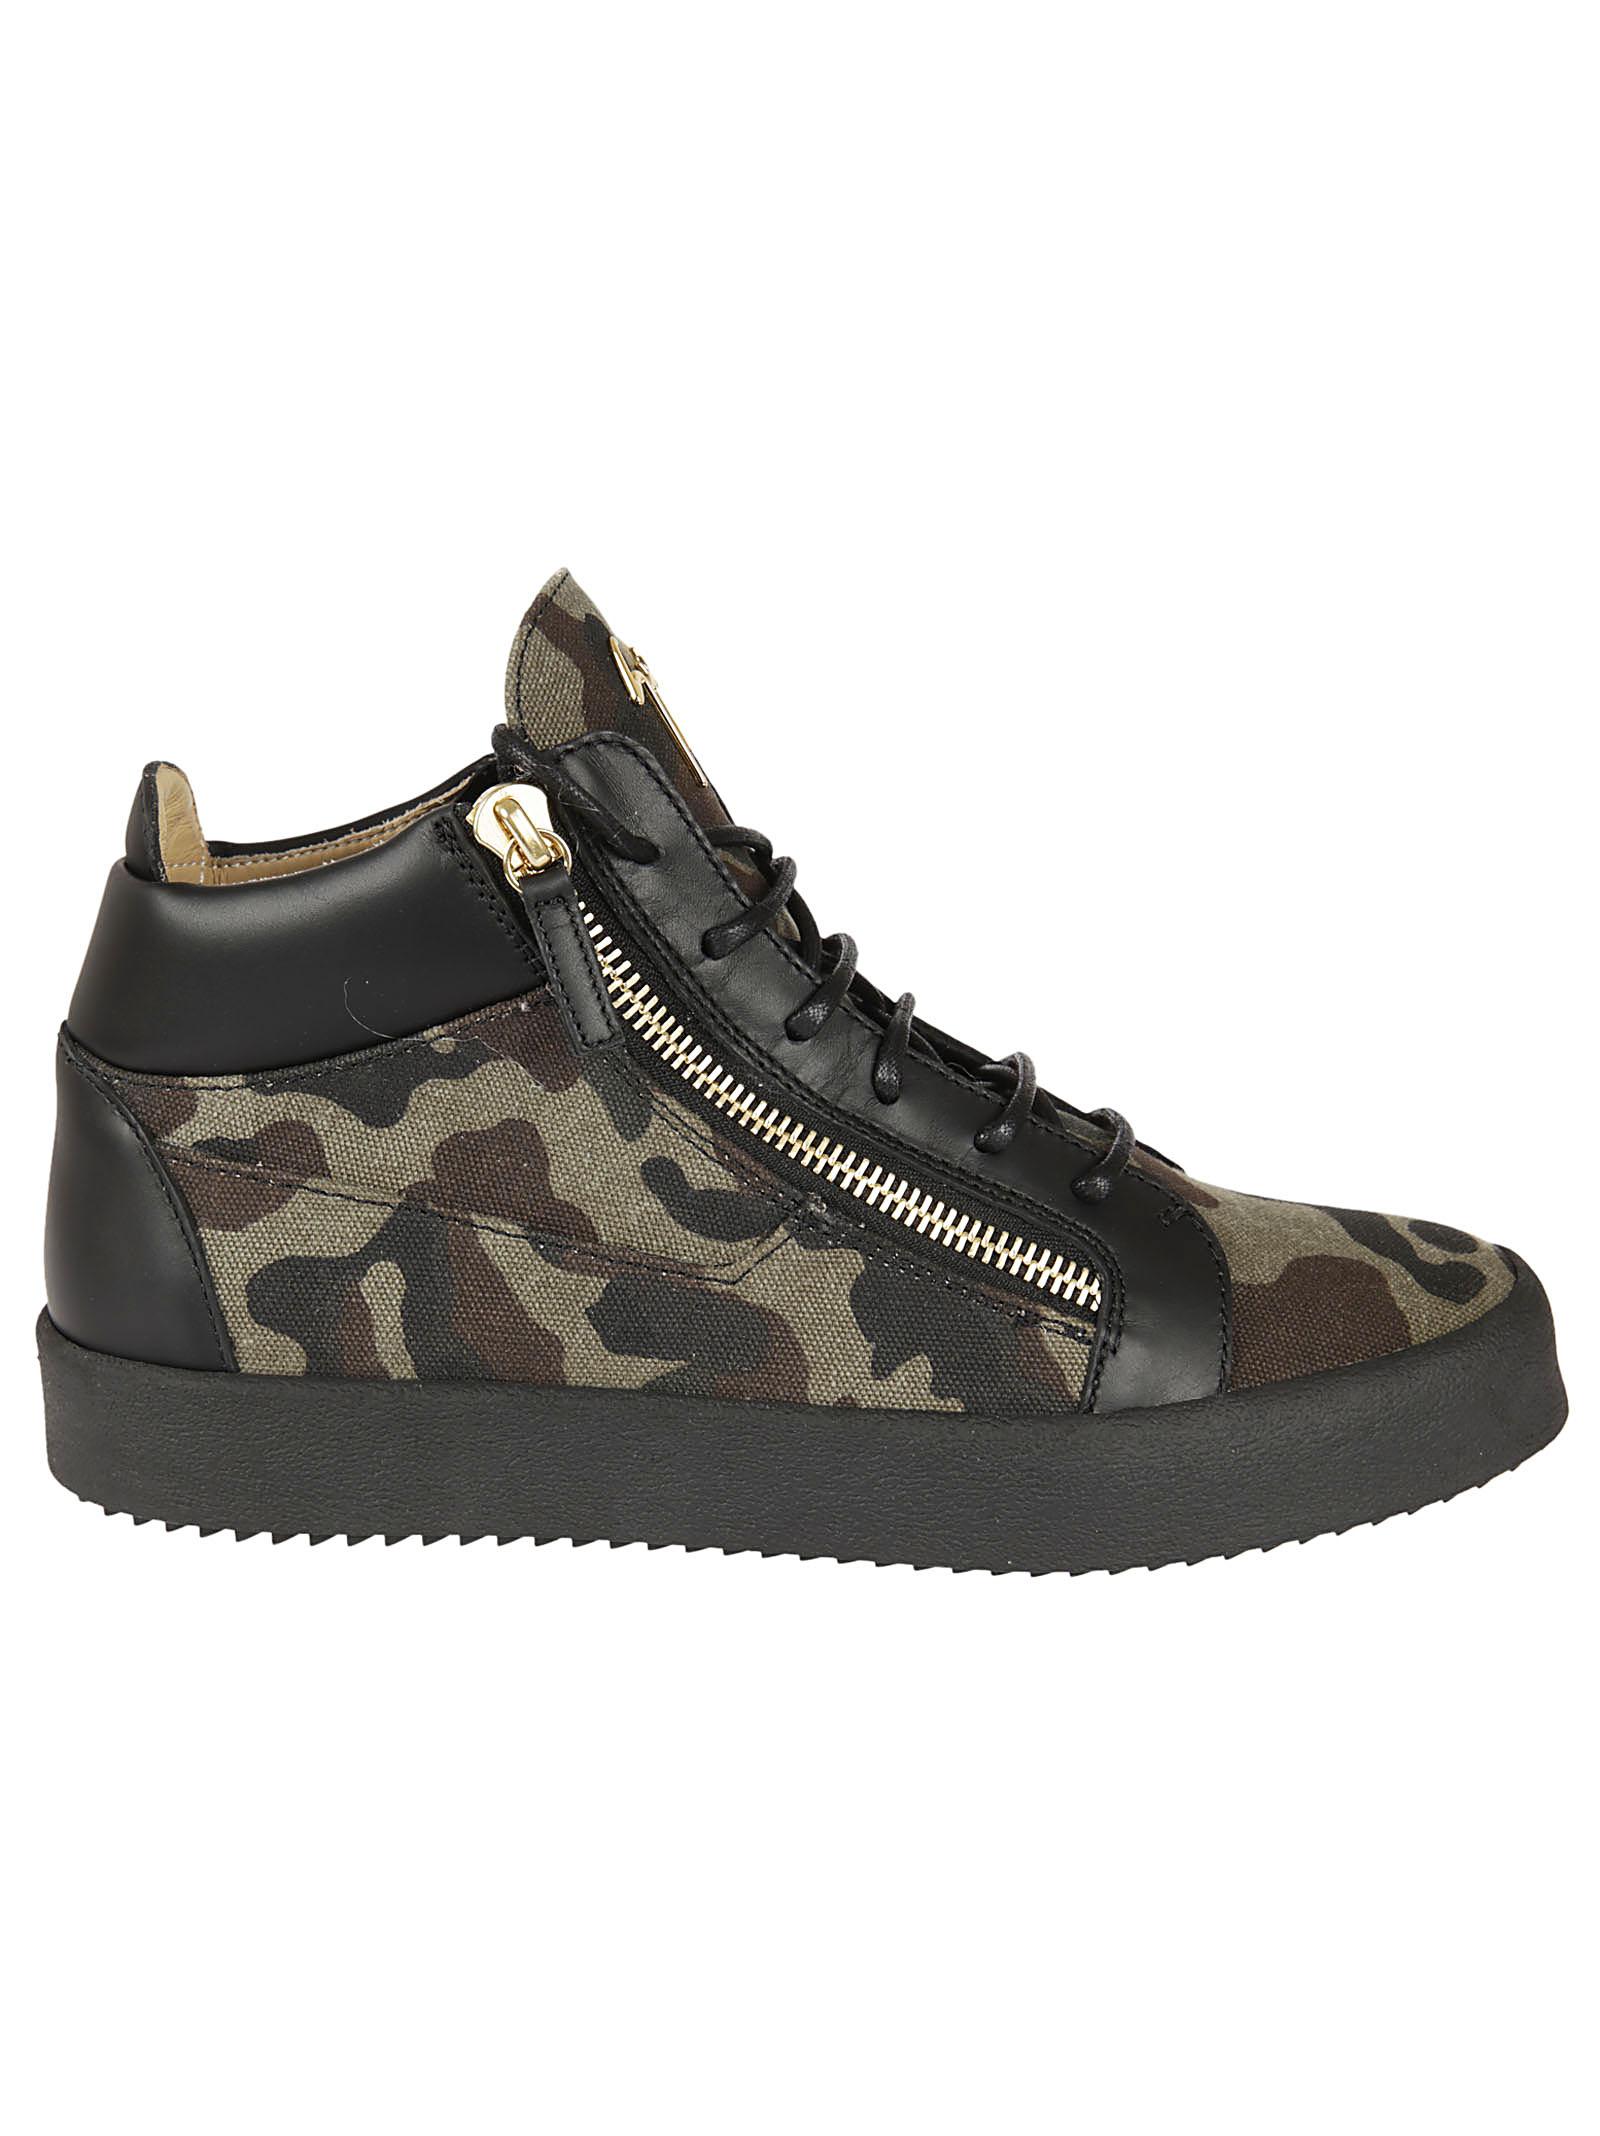 Giuseppe Zanotti Giuseppe Zanotti Camouflage Kriss Mid-Top Sneakers